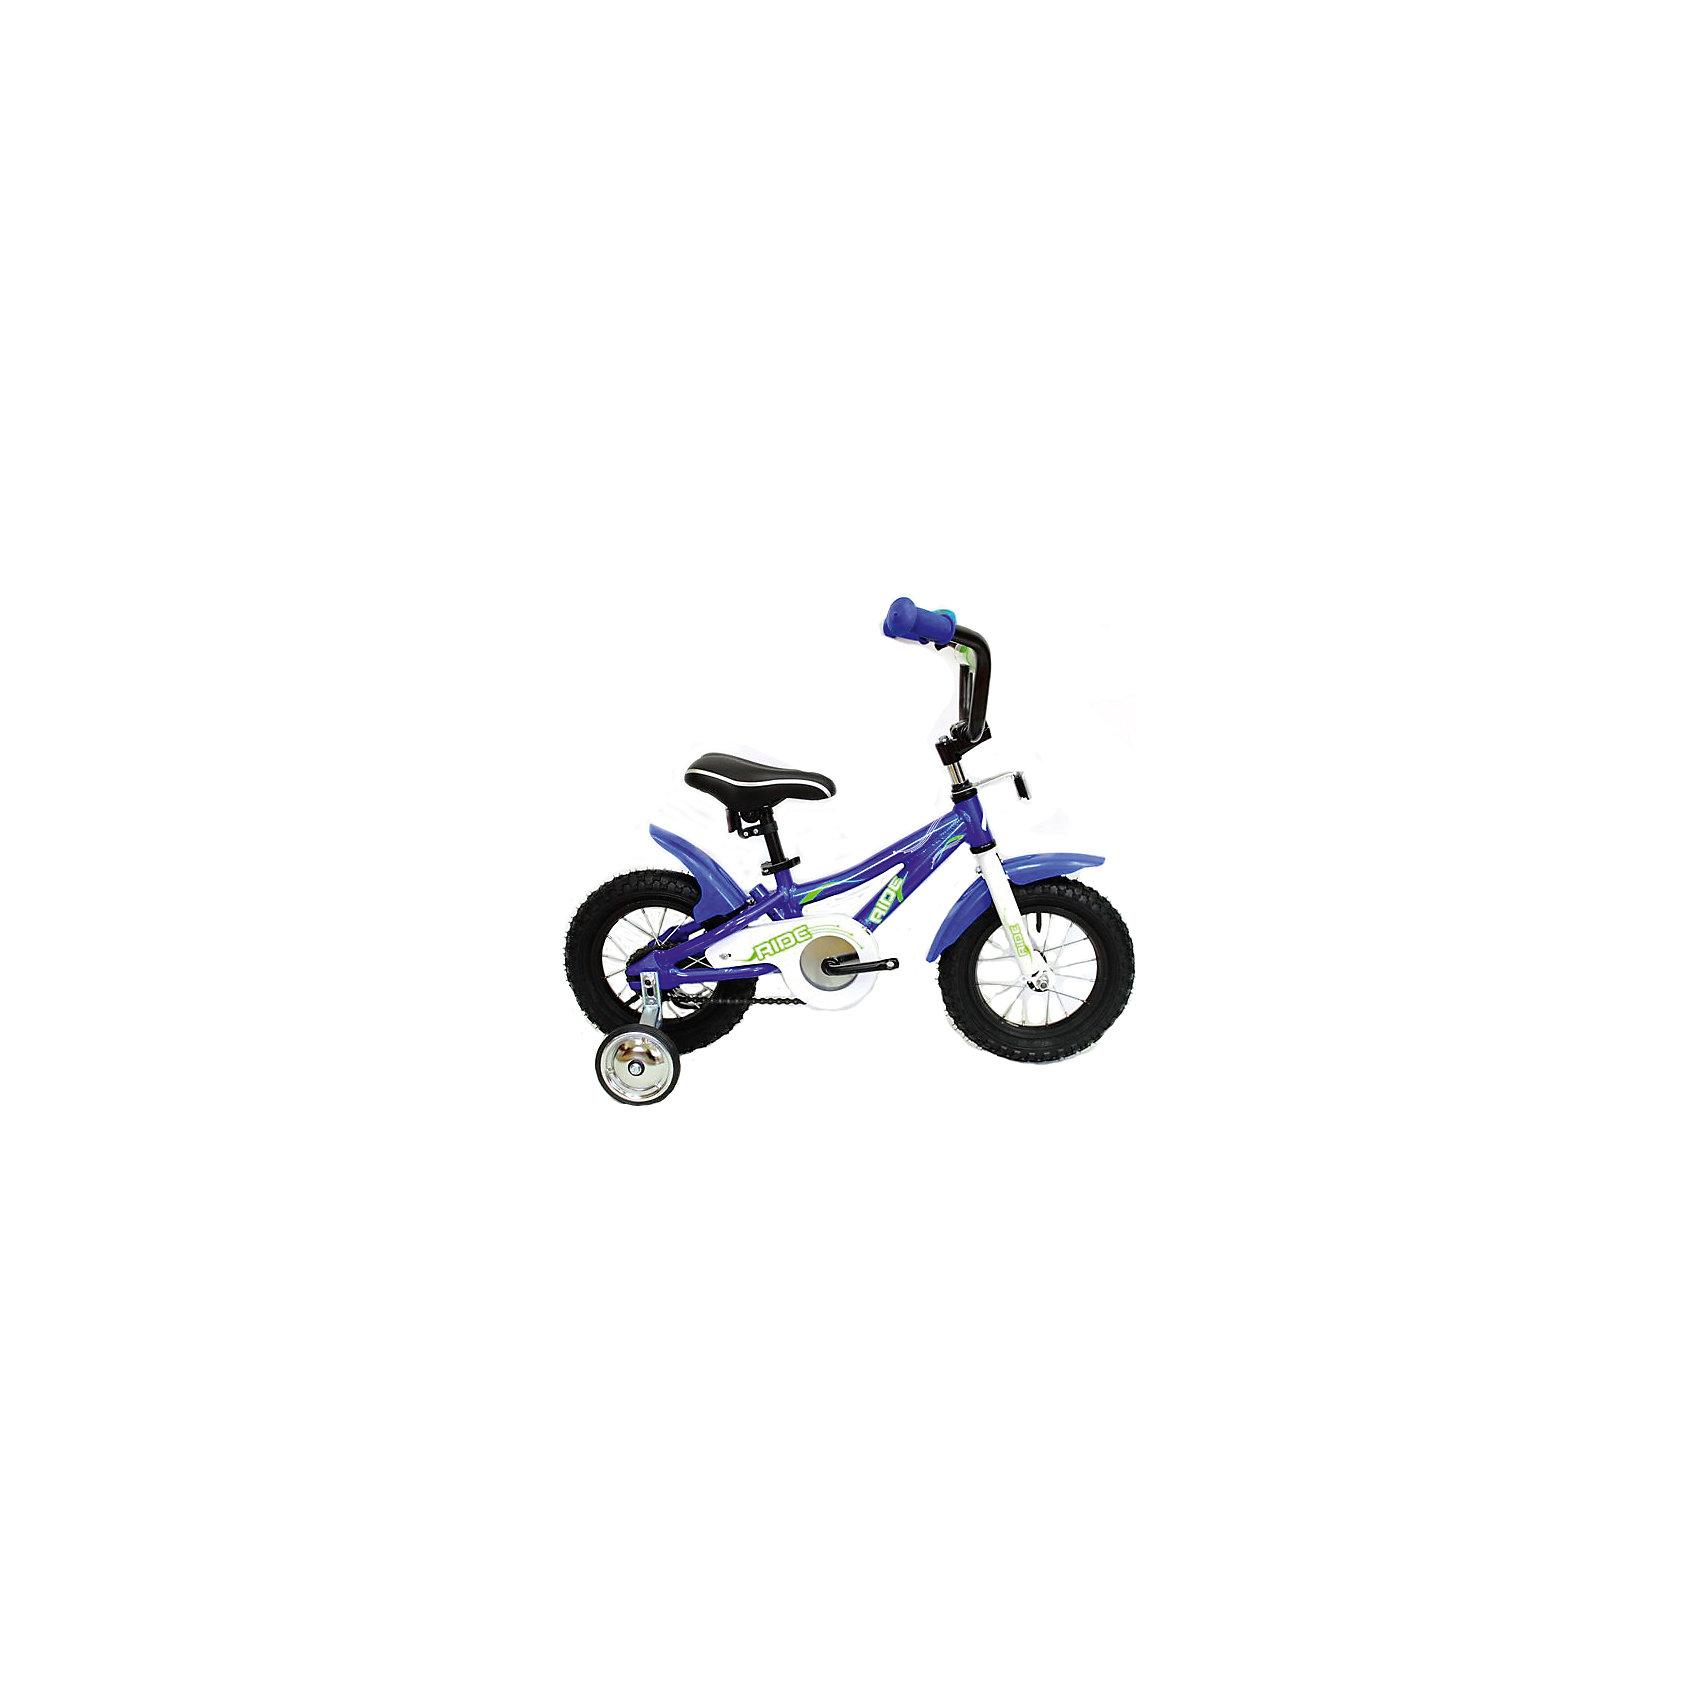 ве-лосипе-д-ride-mars-синий